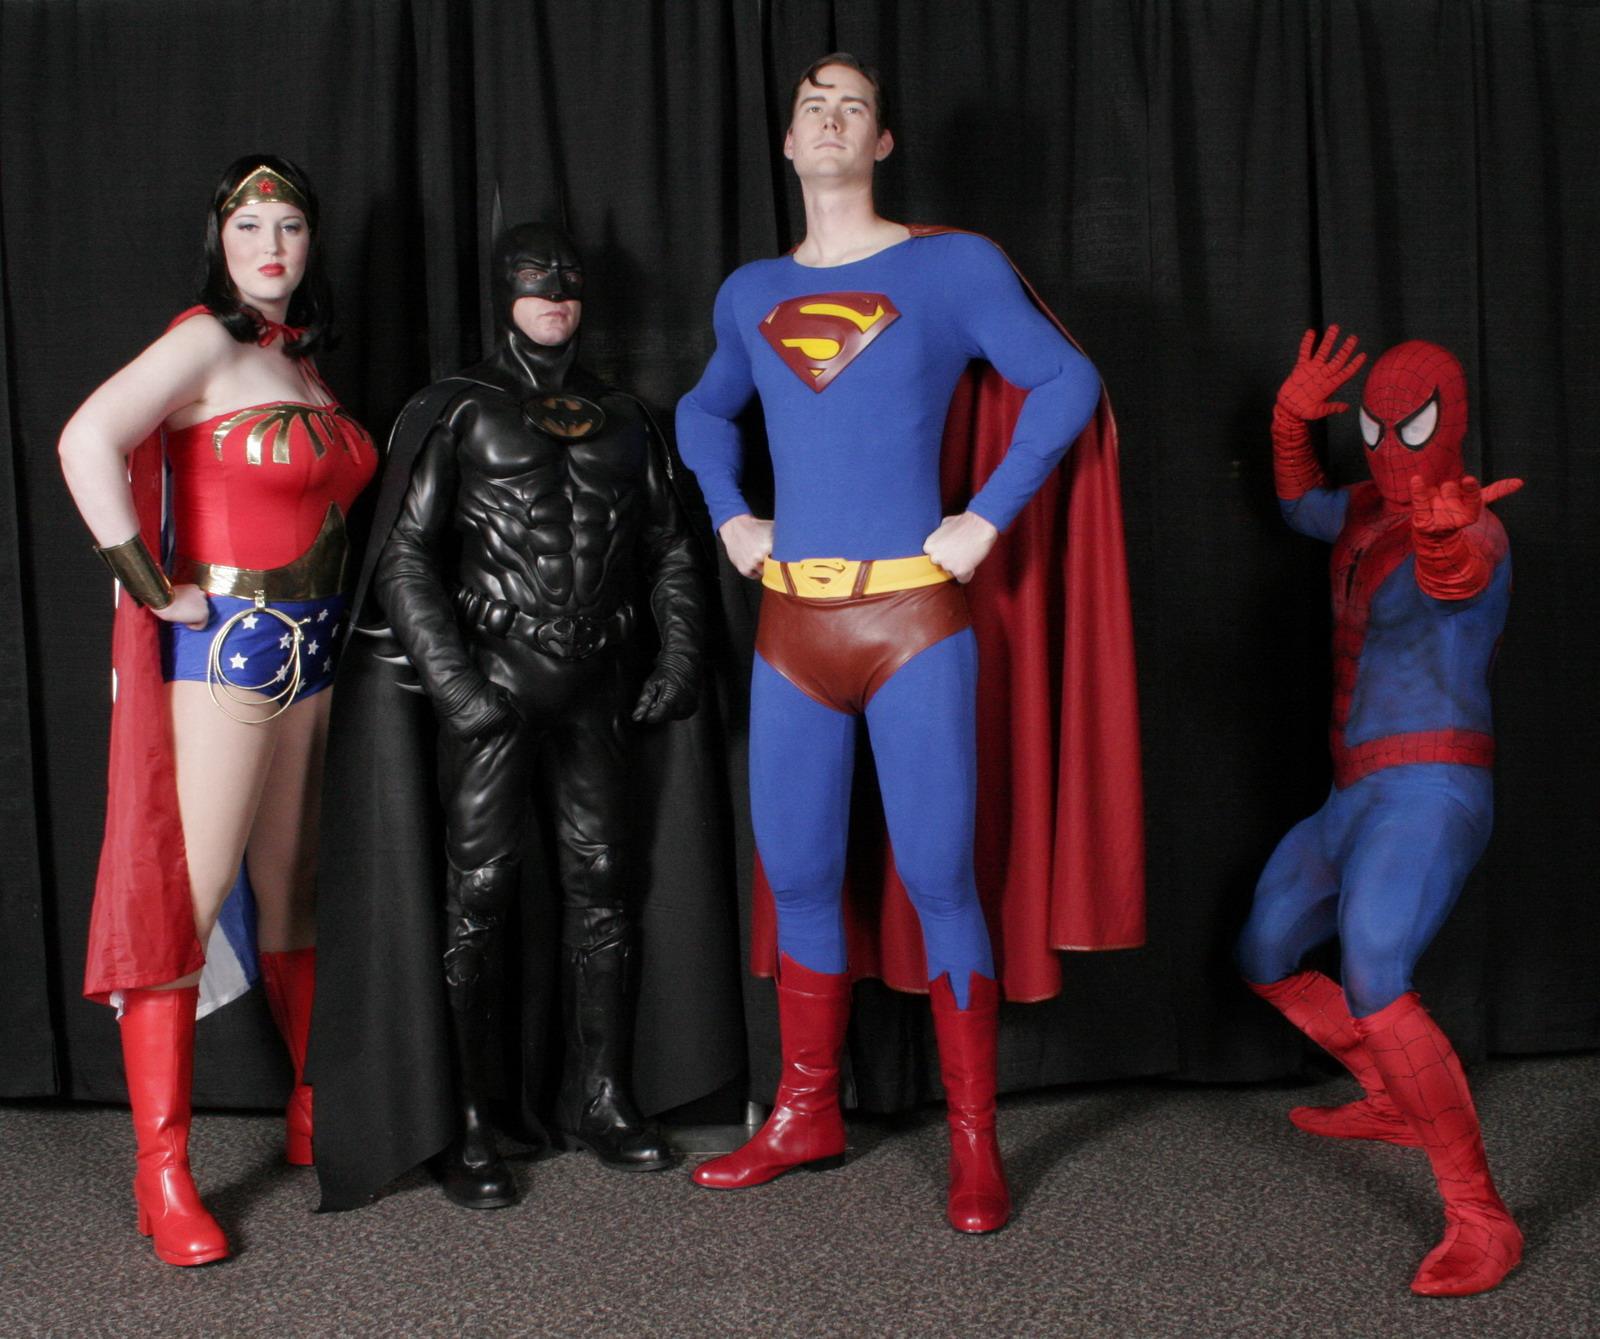 EPIC SUPER HERO PARTY